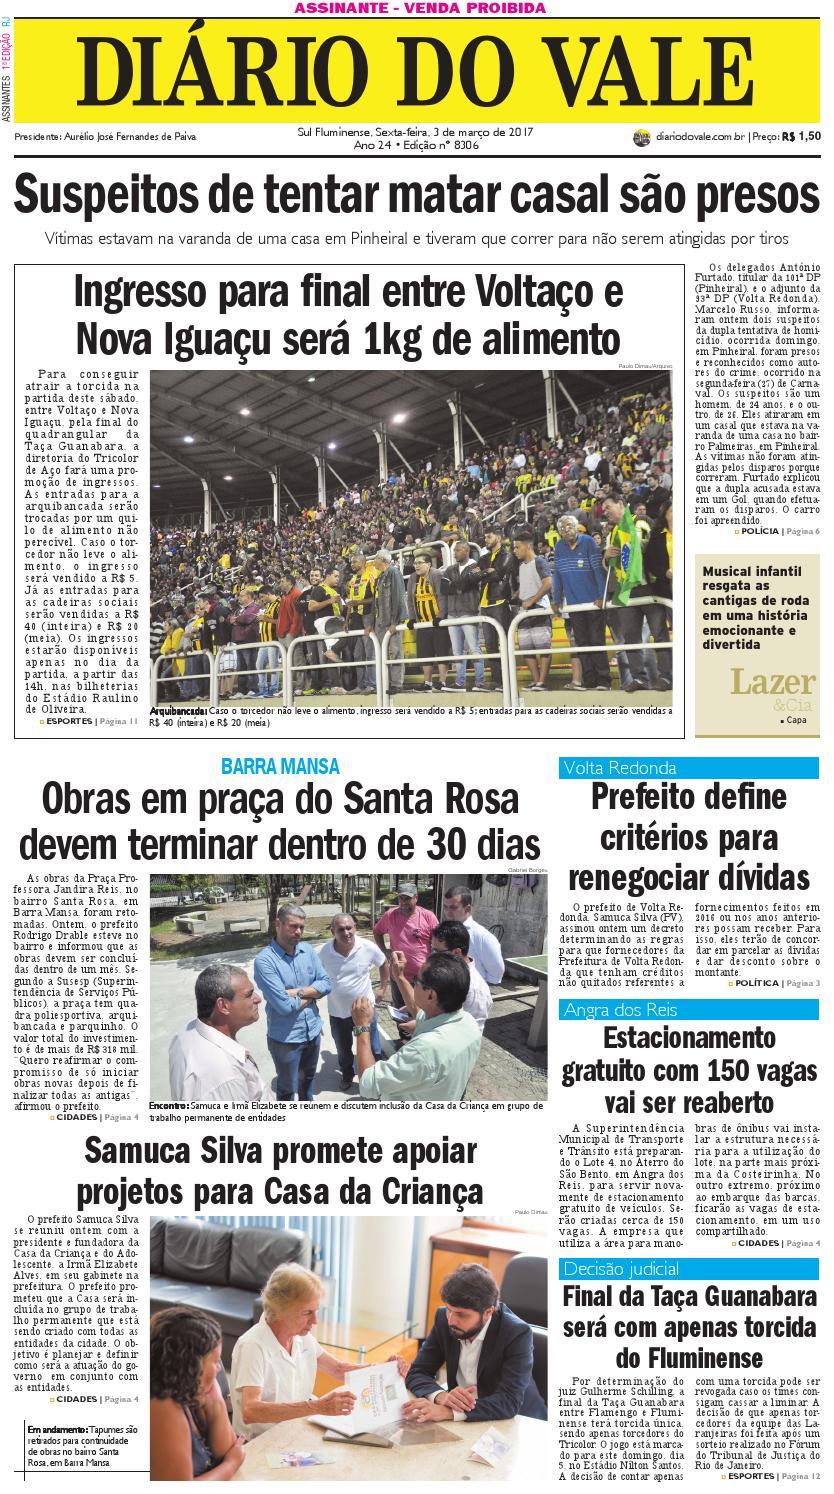 7b339a40914 8306 diario do vale sexta feira 03 03 2017 by Diário do Vale - issuu